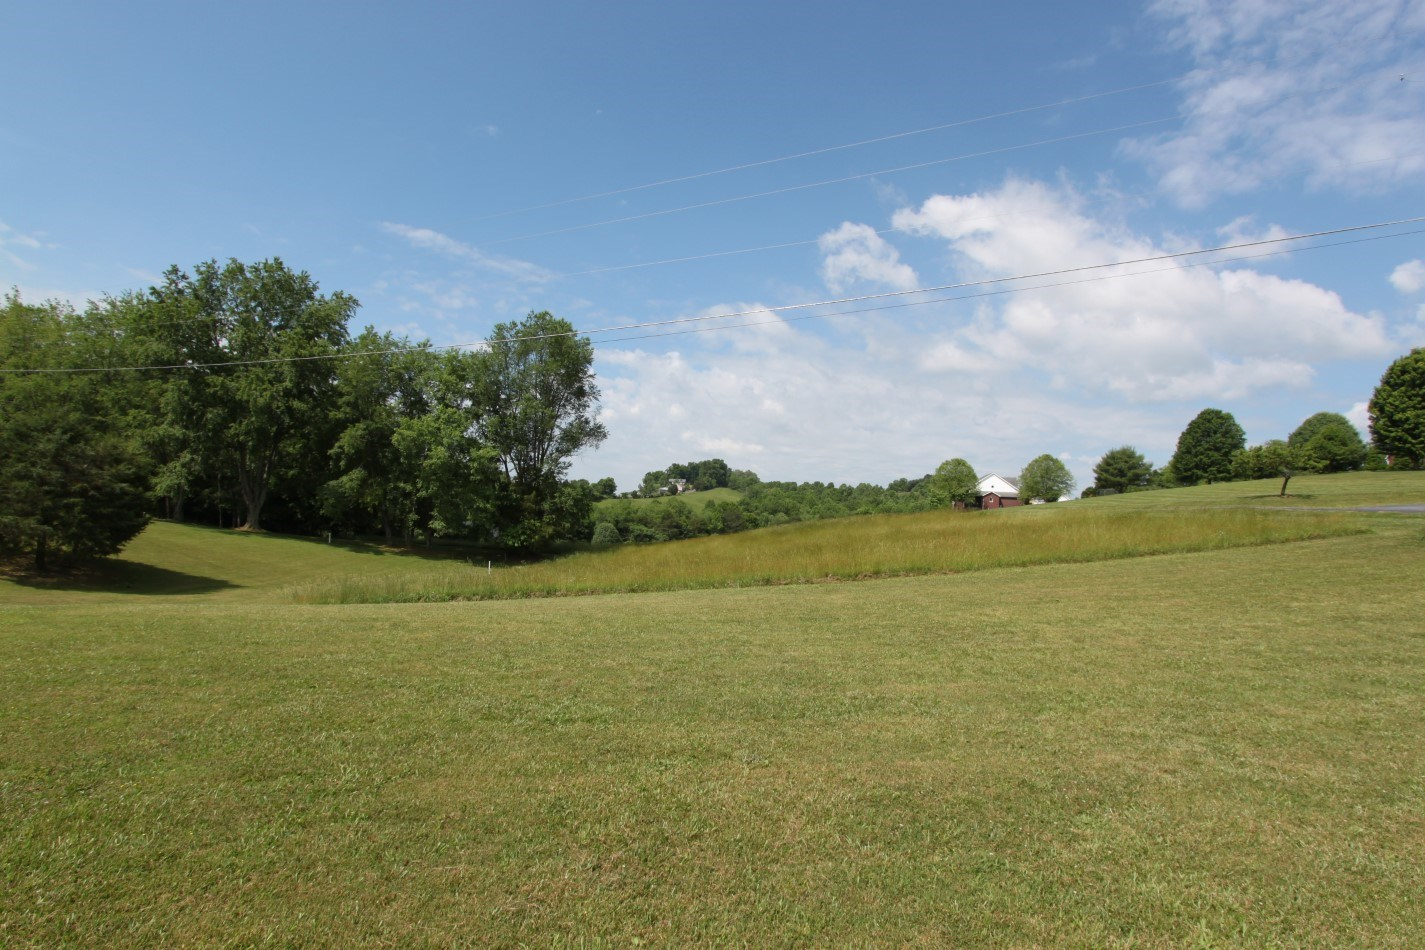 Home Site Near South Holston Lake For Sale In Abingdon VA